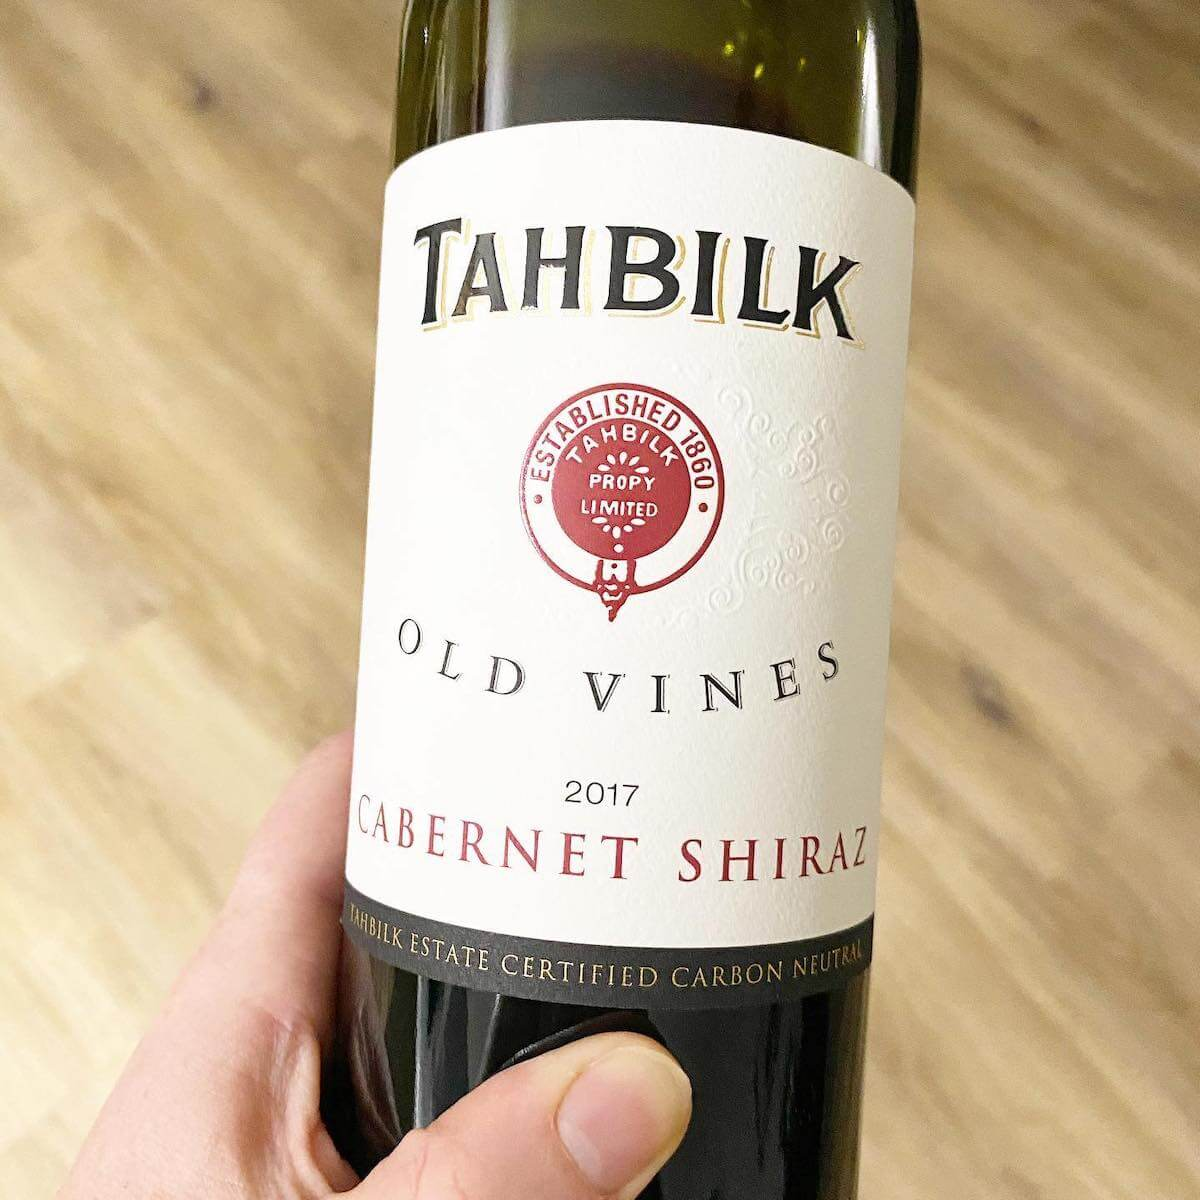 Tahbilk Old Vines 2017 Cabernet Shiraz